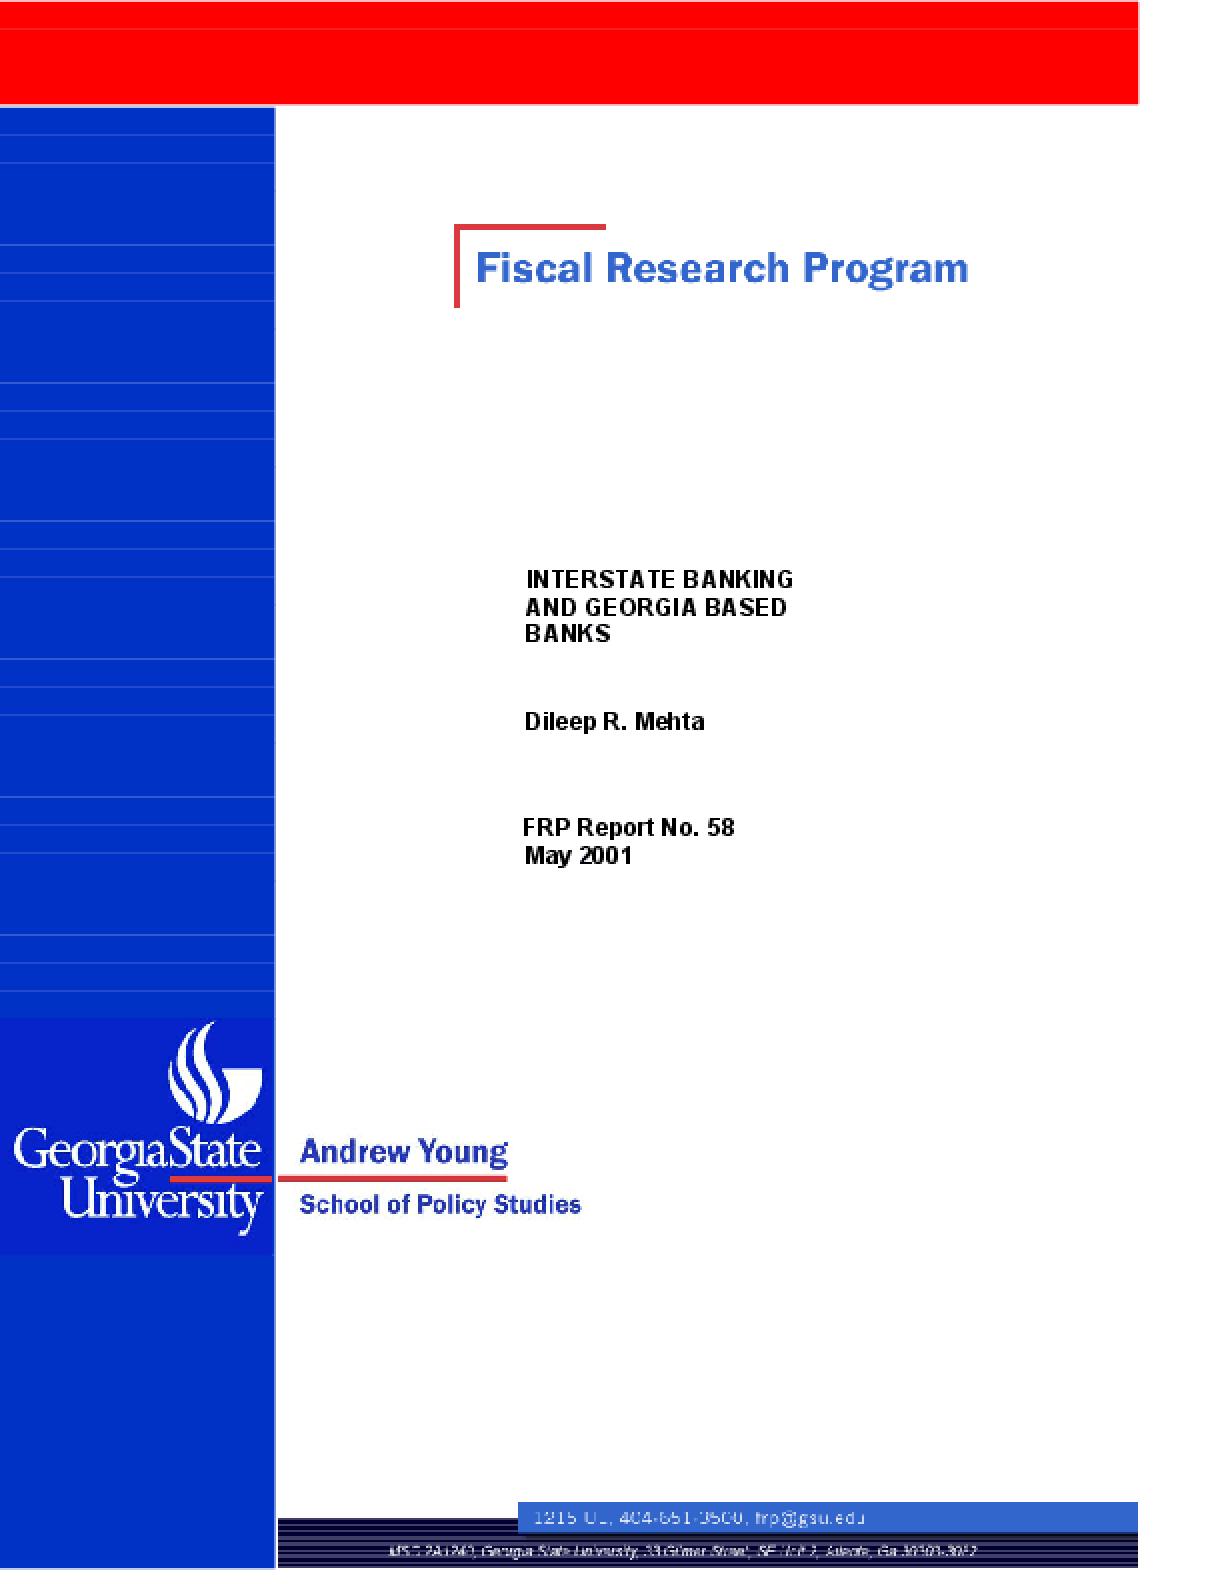 Interstate Banking and Georgia-Based Banks